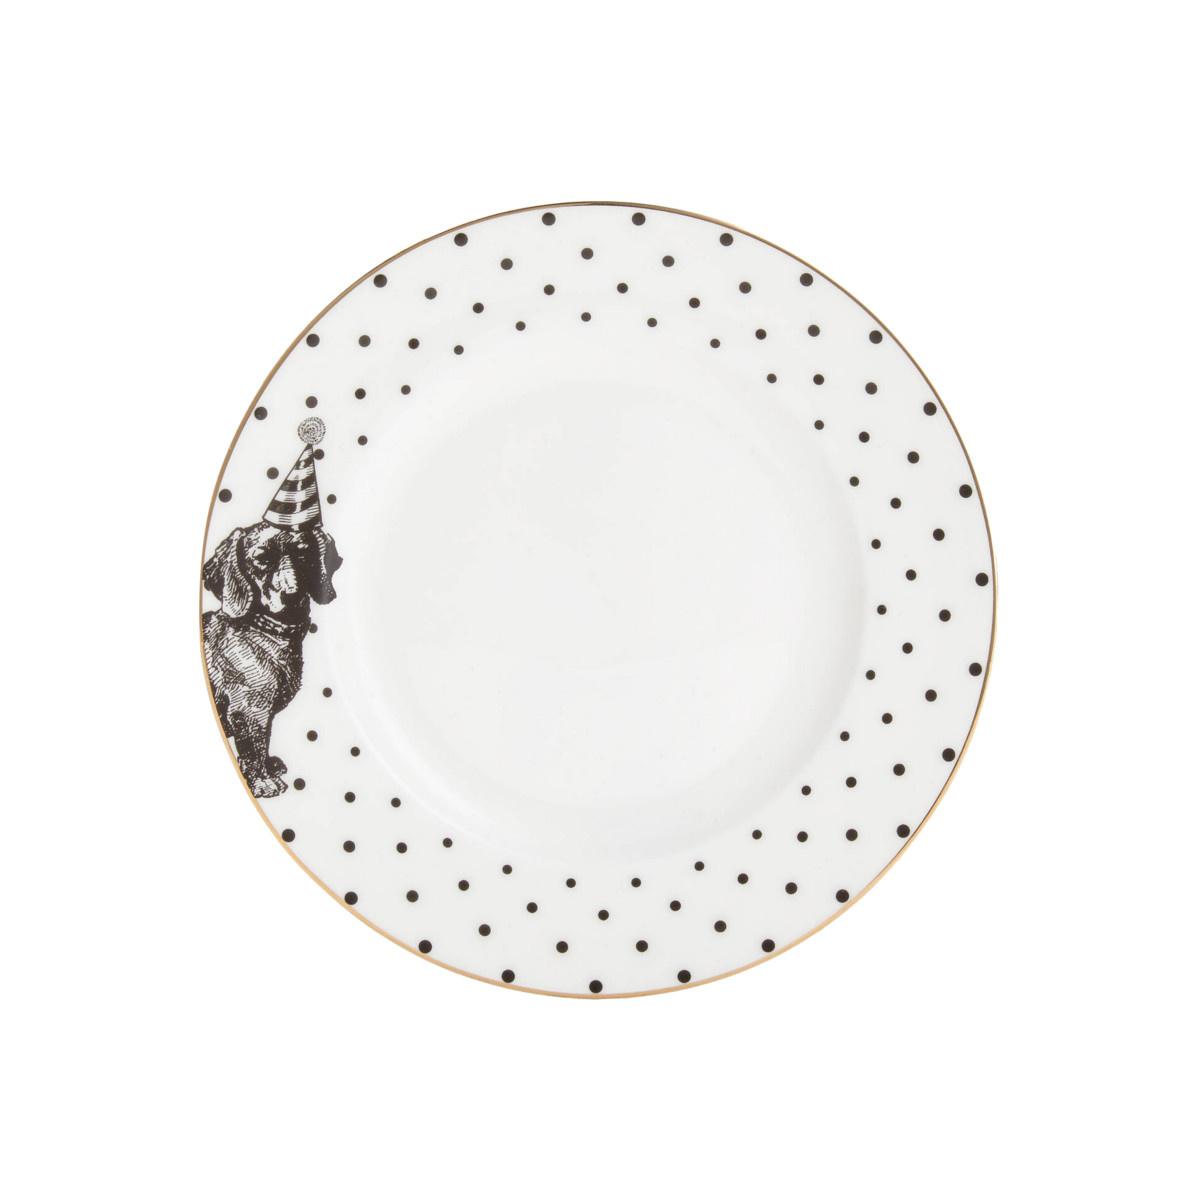 Yvonne Ellen Yvonne Ellen London Monochrome 2-er Set Teller Ø 16 cm - Dachshund Motiv - Bone China Porzellan